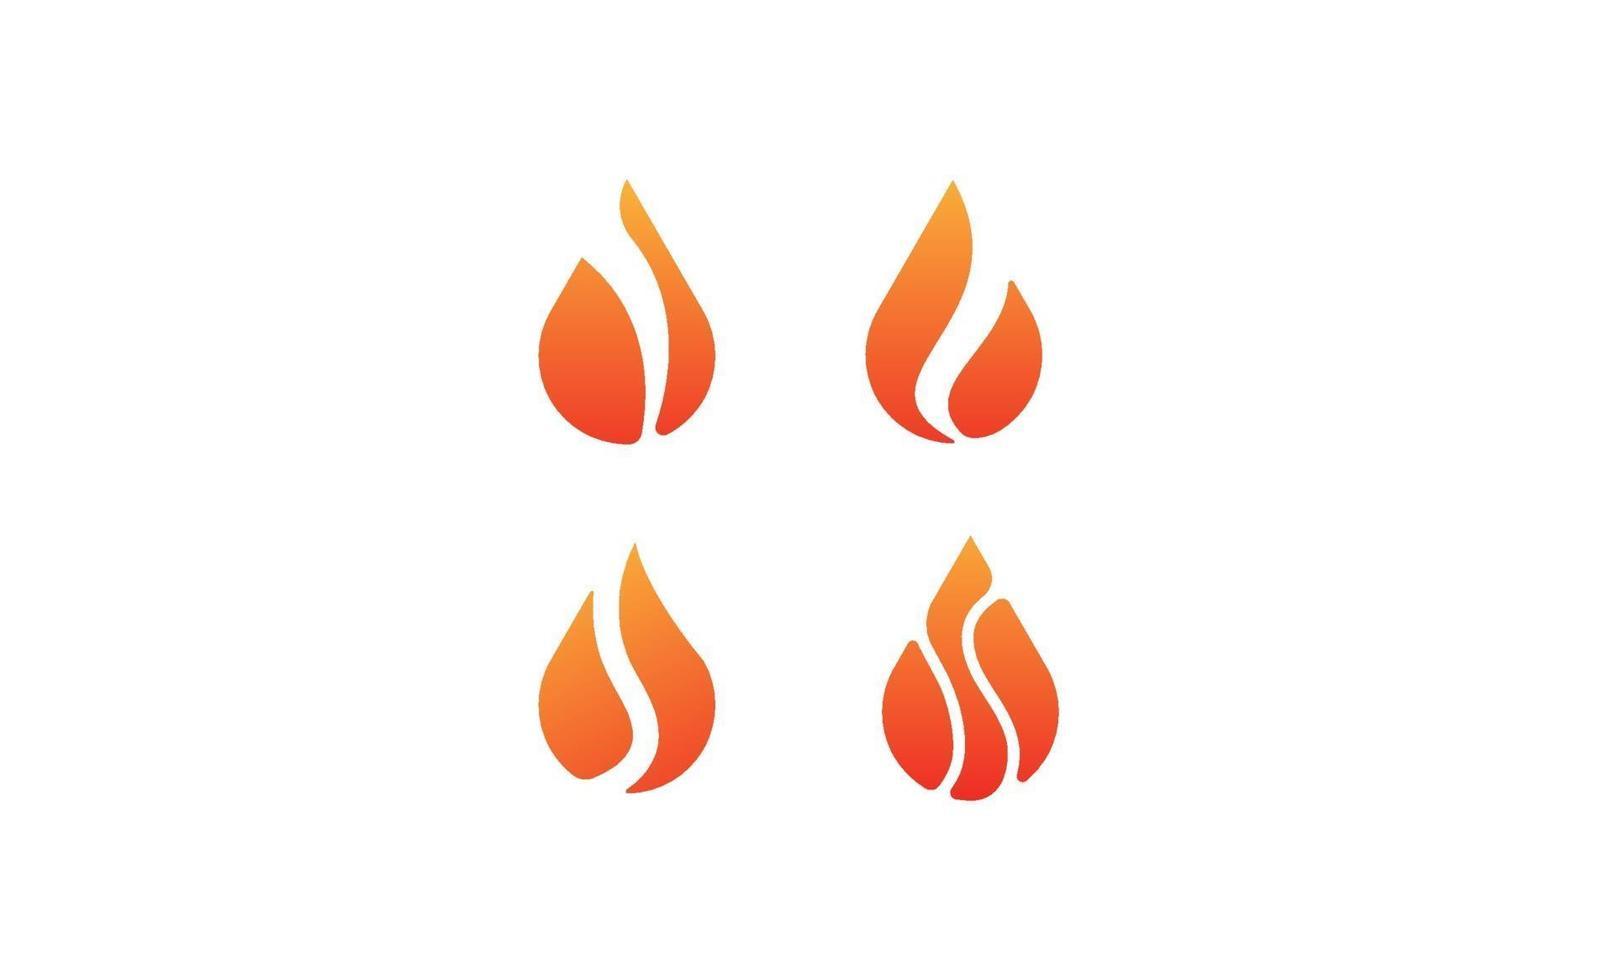 fire flame logo set vector template illustration graphic design